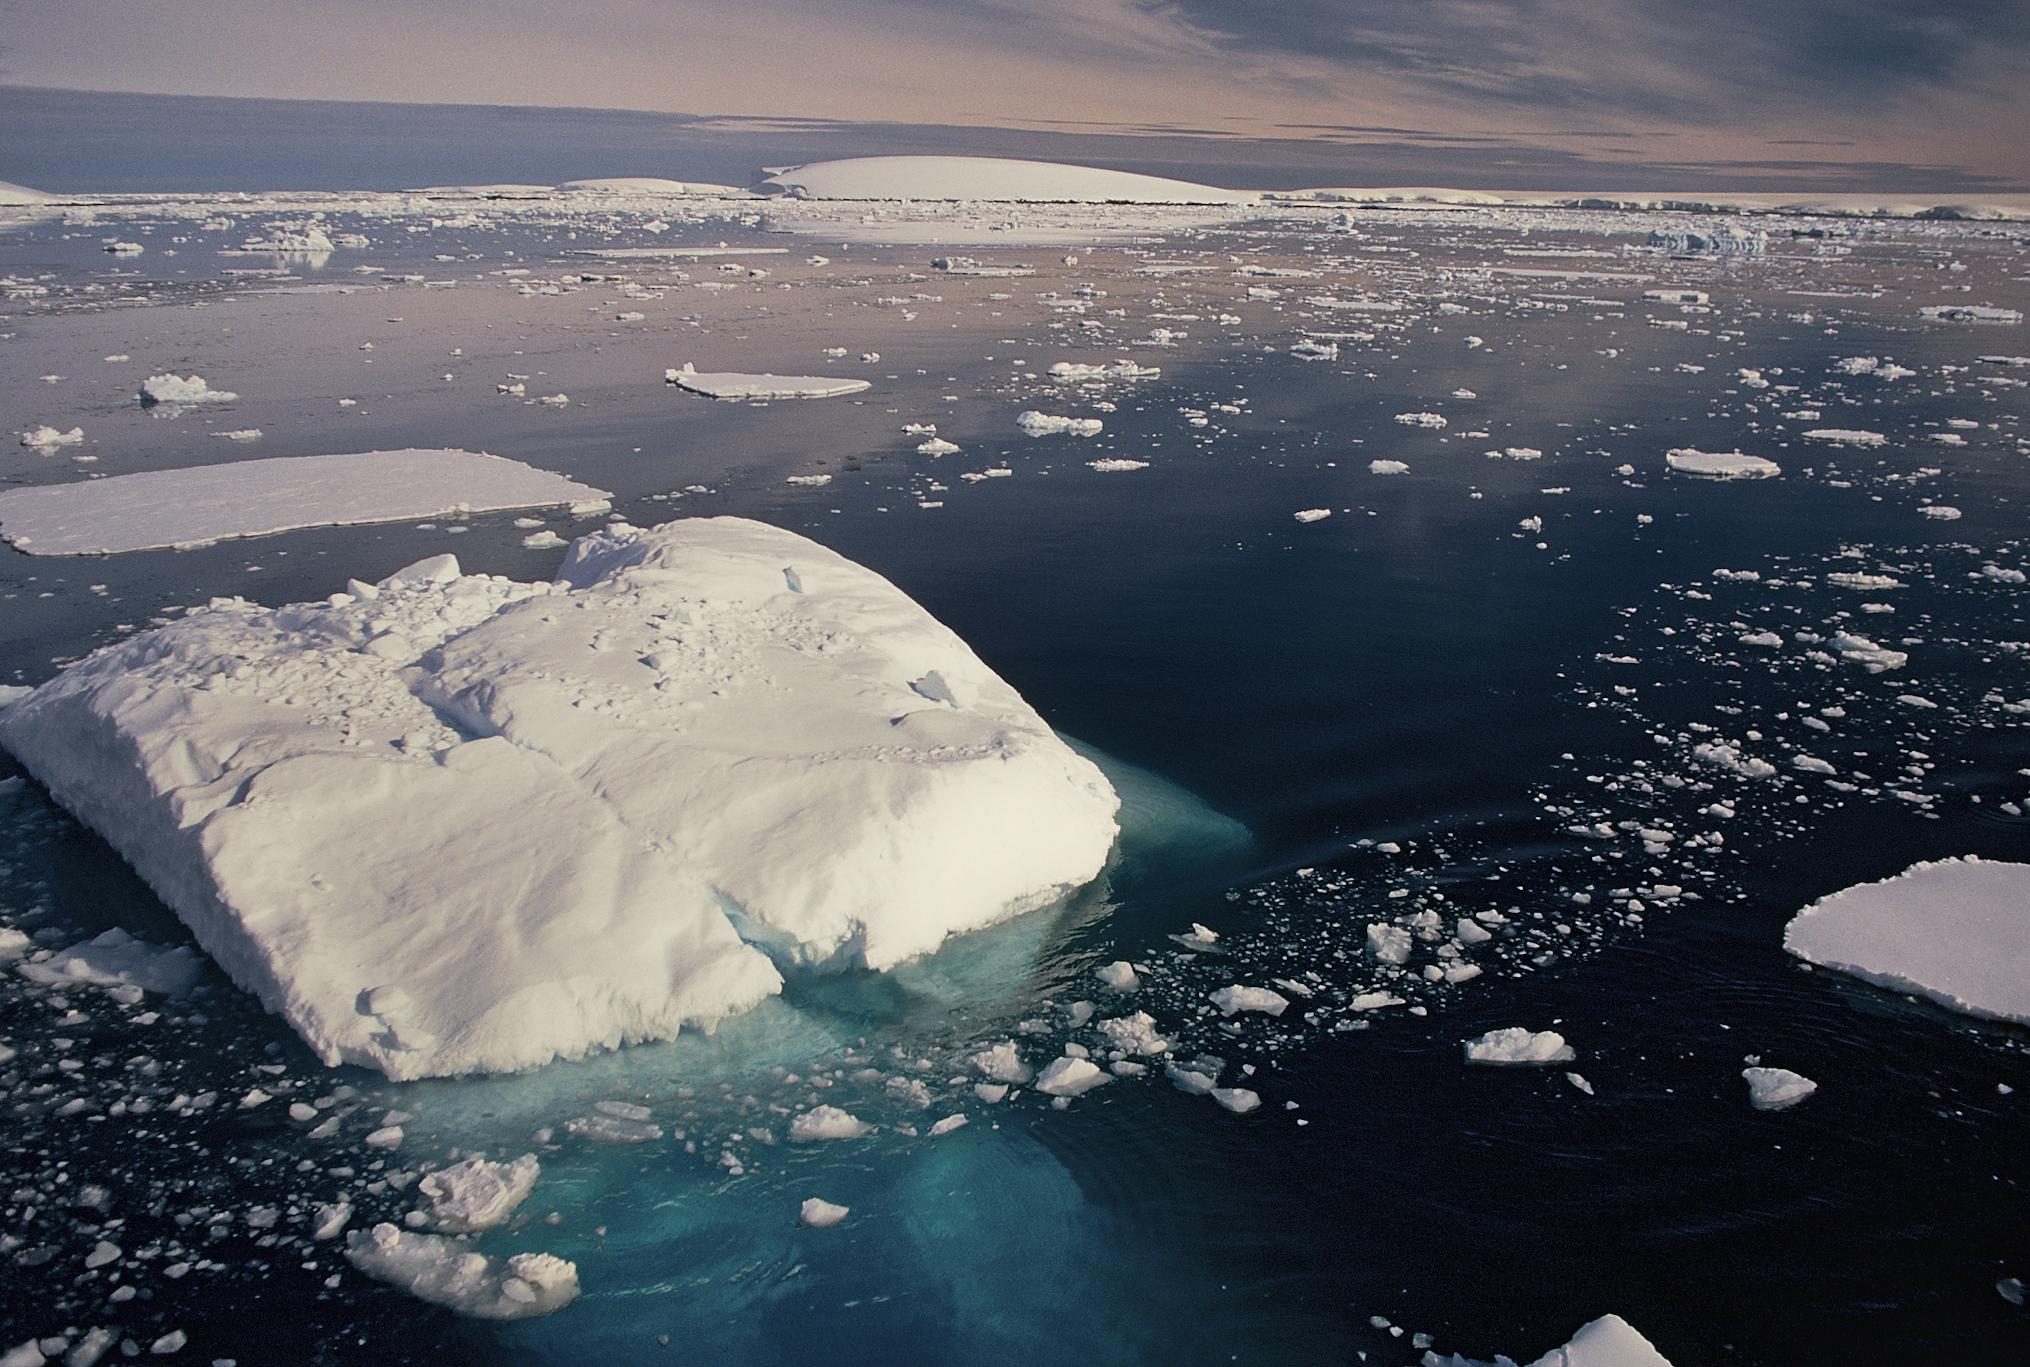 floating-ice-antarctic-peninsula_7194-2030x1367px